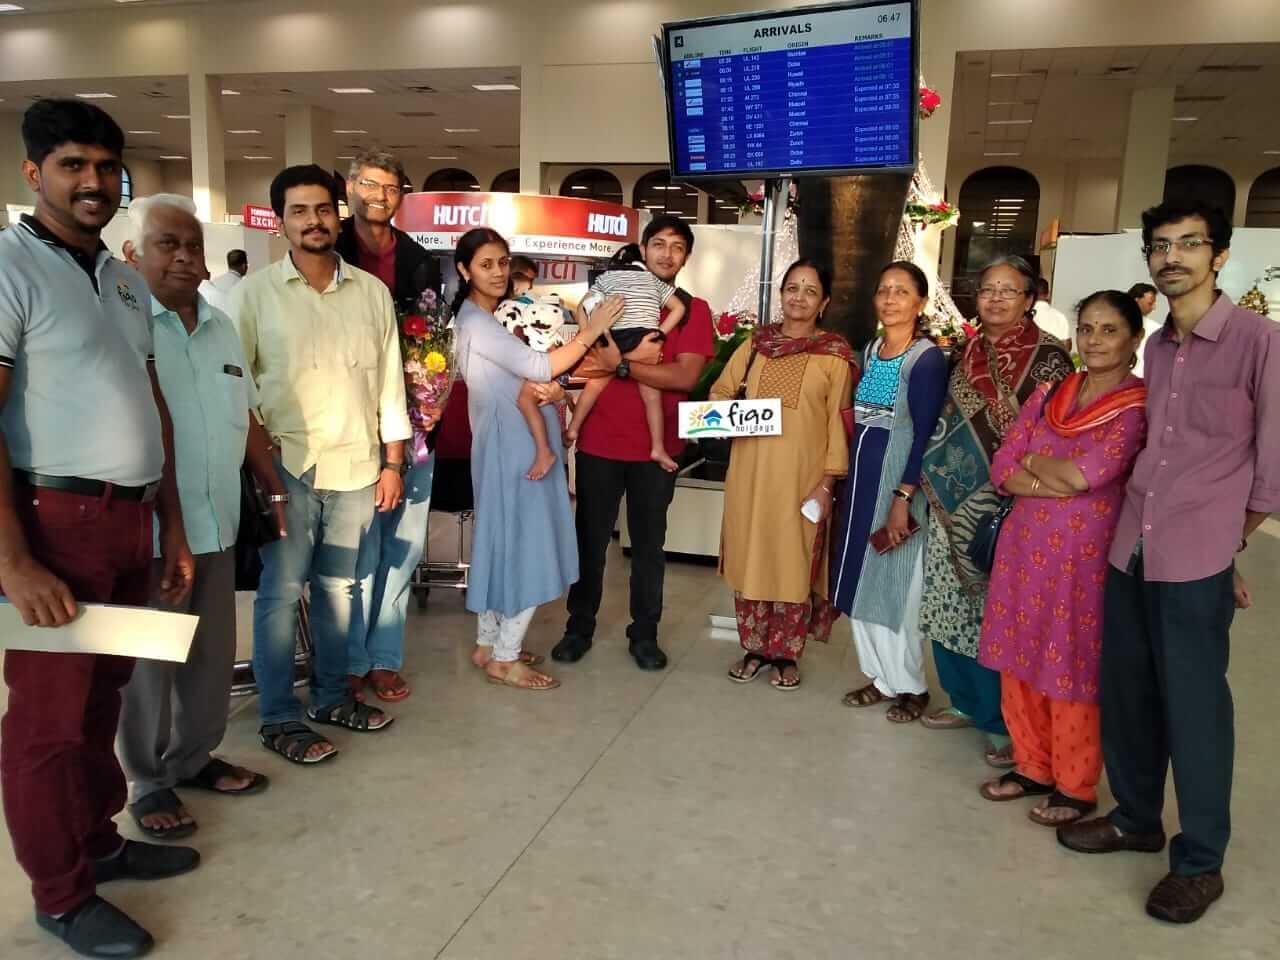 meet-and-greet-indian-senior-group-travel-srilanka